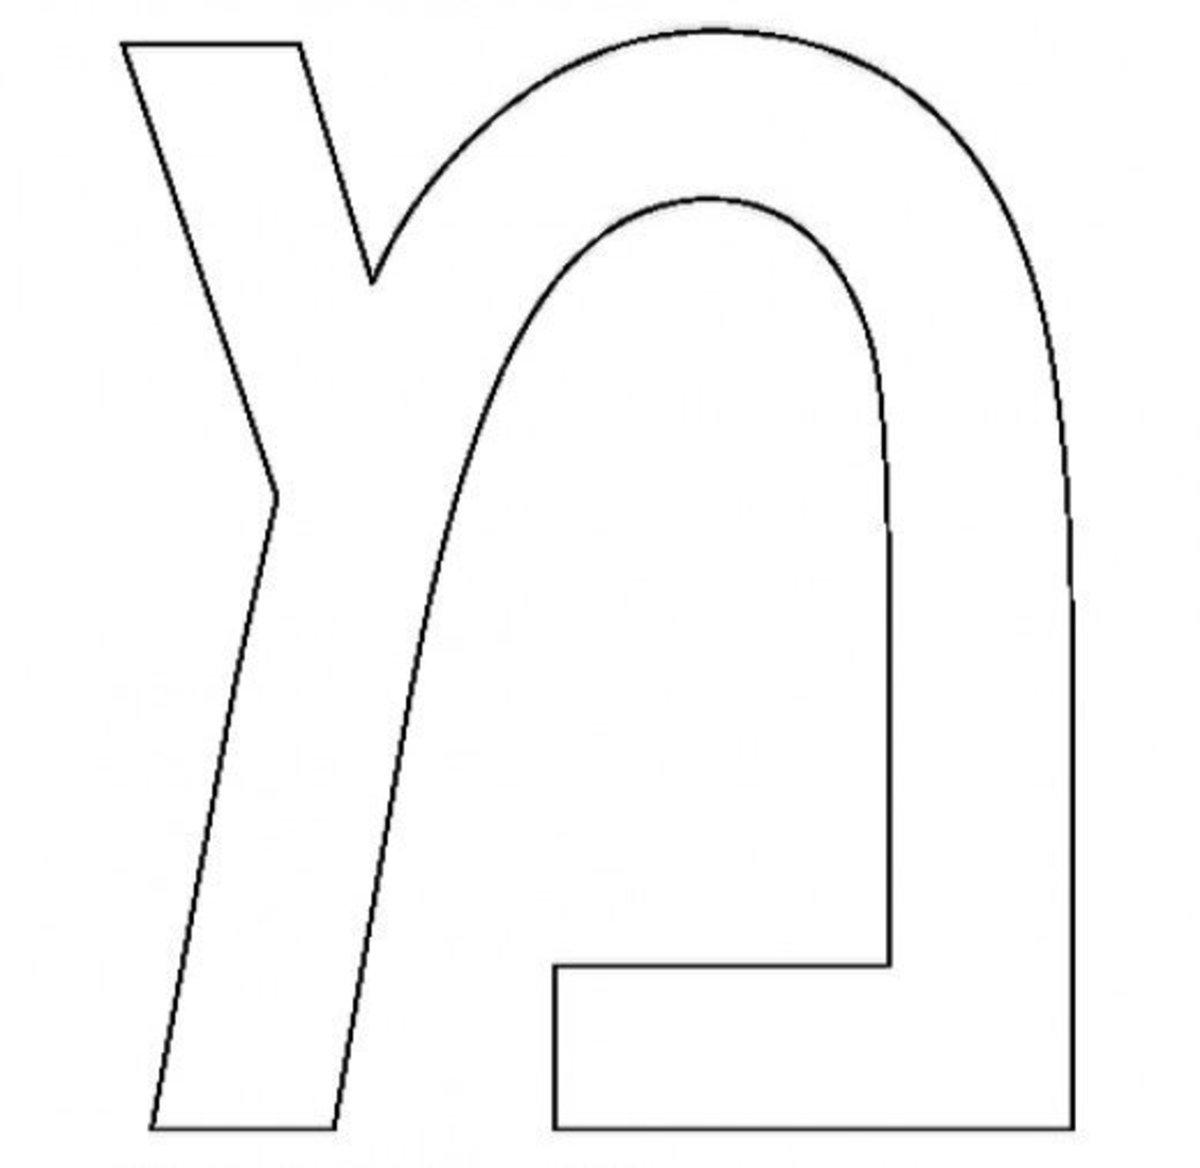 Hebrew Letter Mem Coloring Page - דף צביעה אוֹת מם